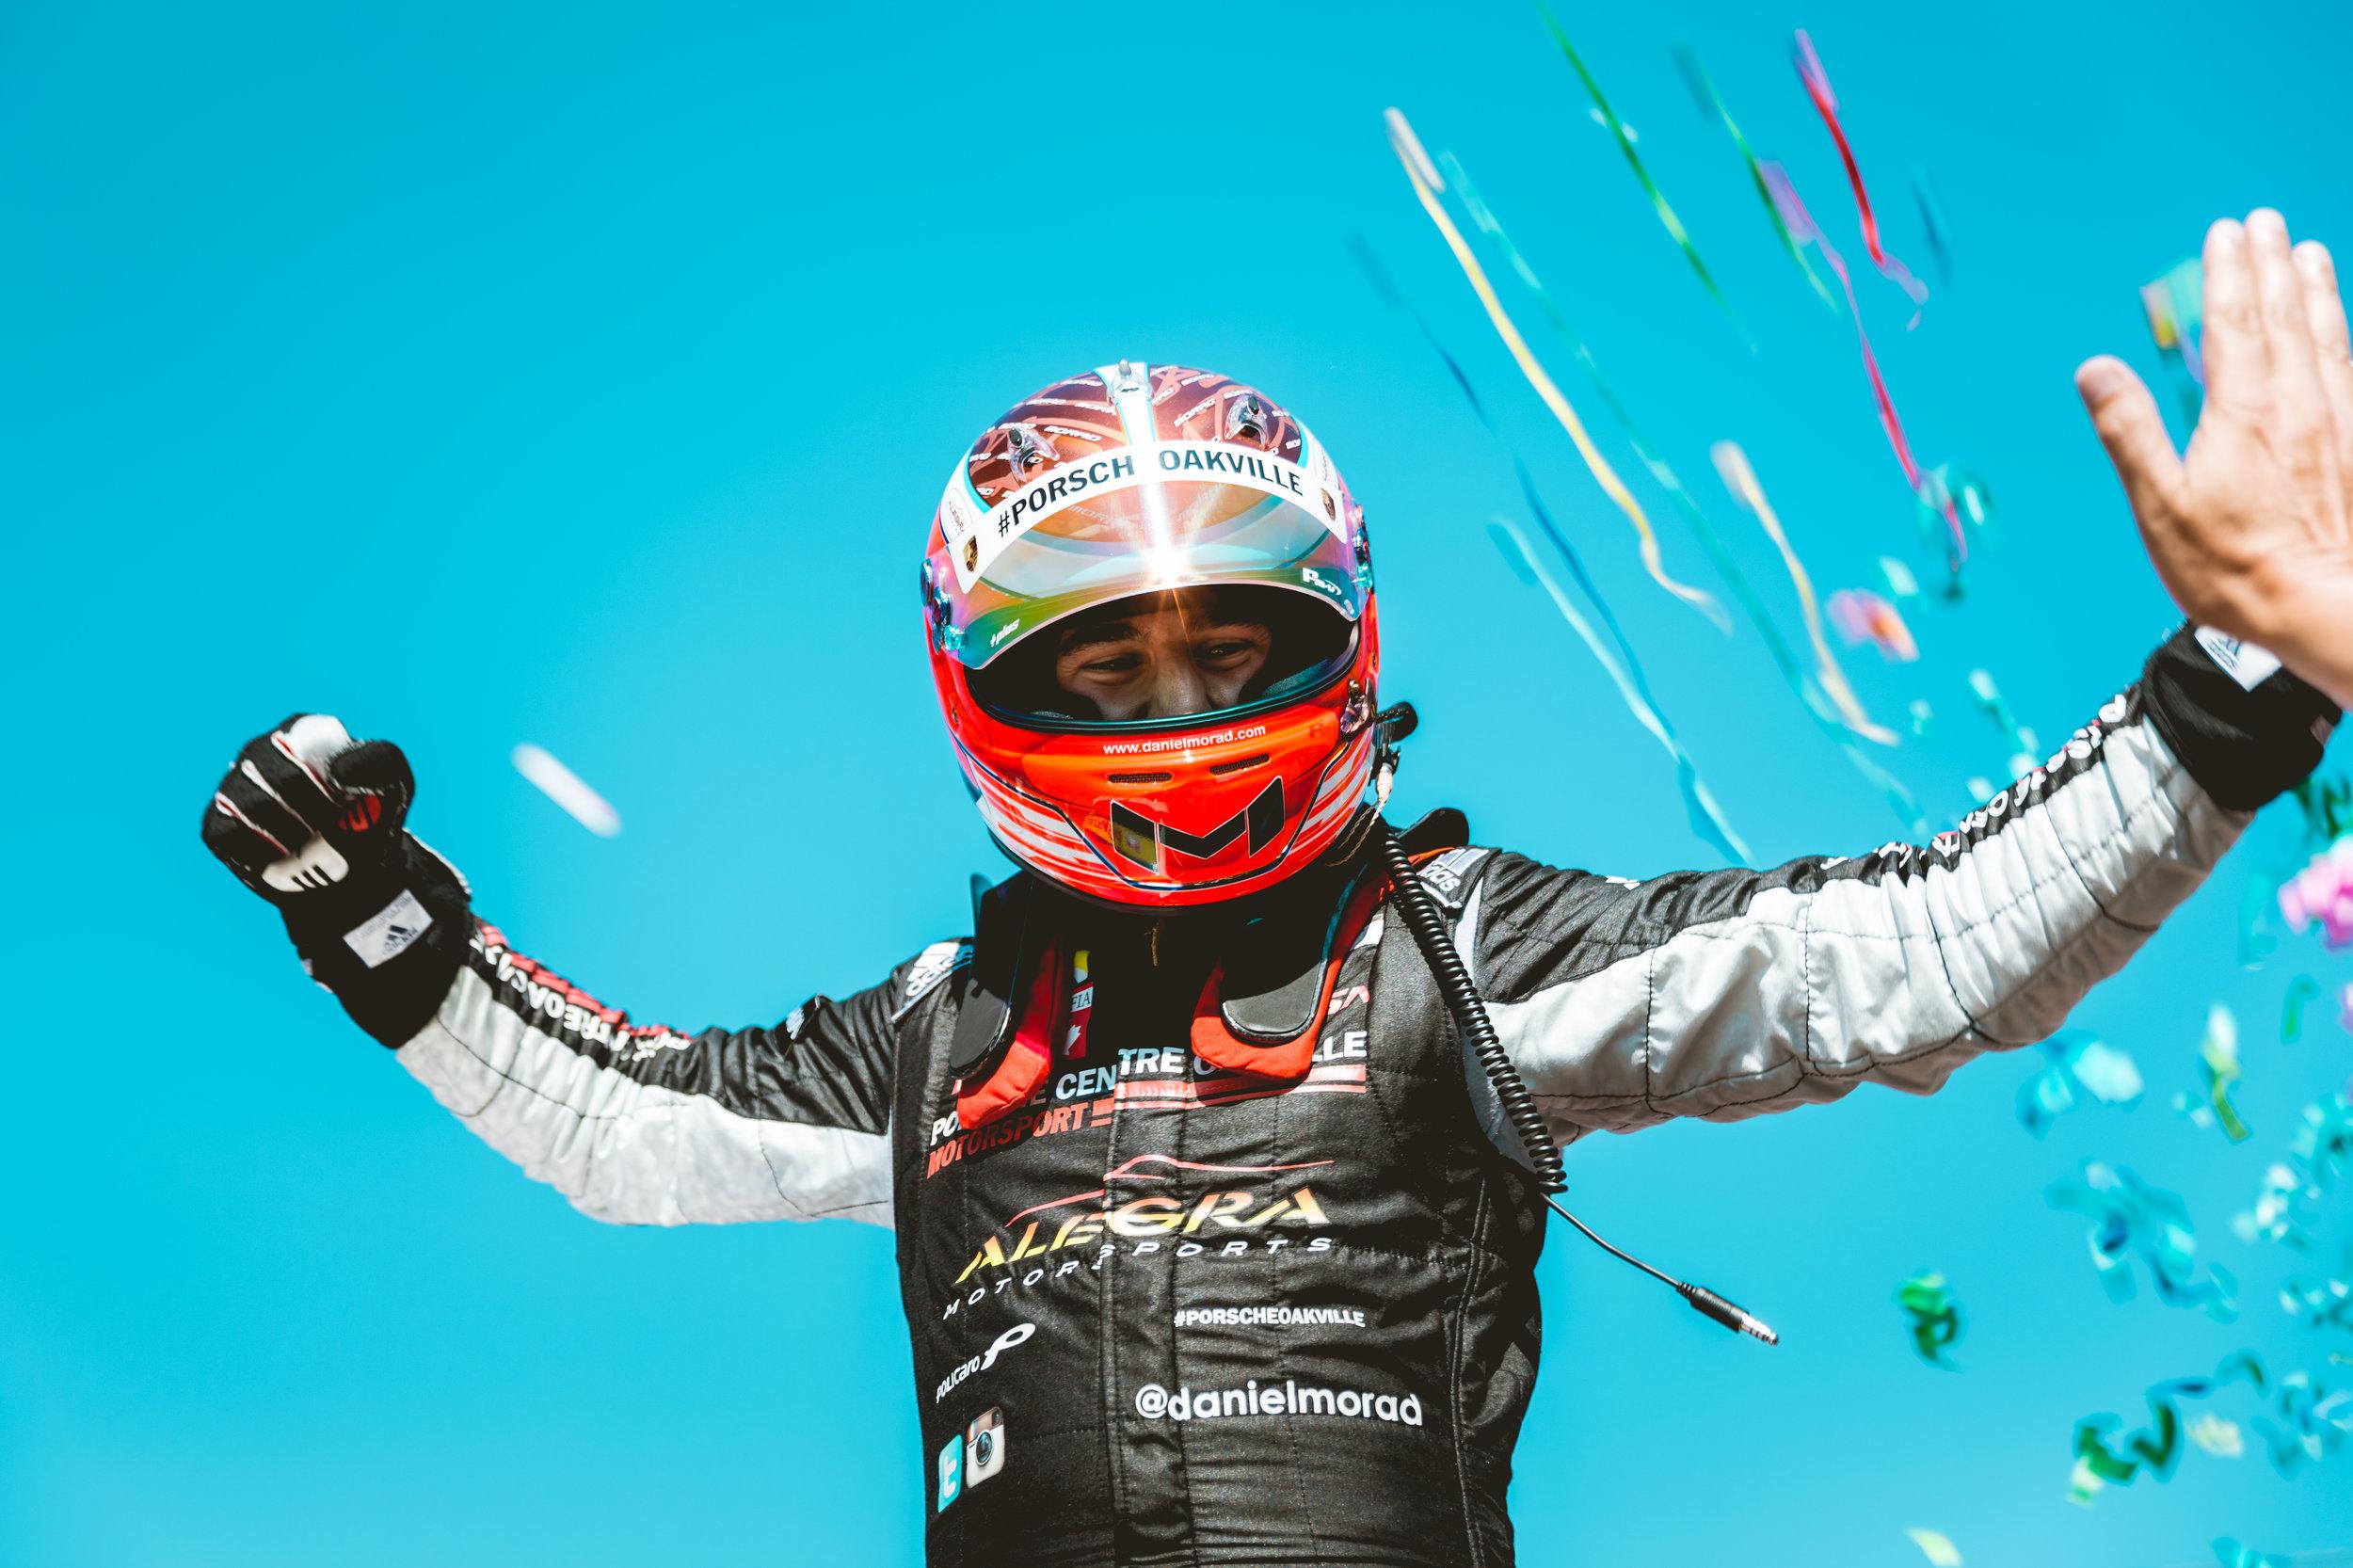 IMSA Porsche GT3 Cup - Silverado 250 Mosport-6578.jpg